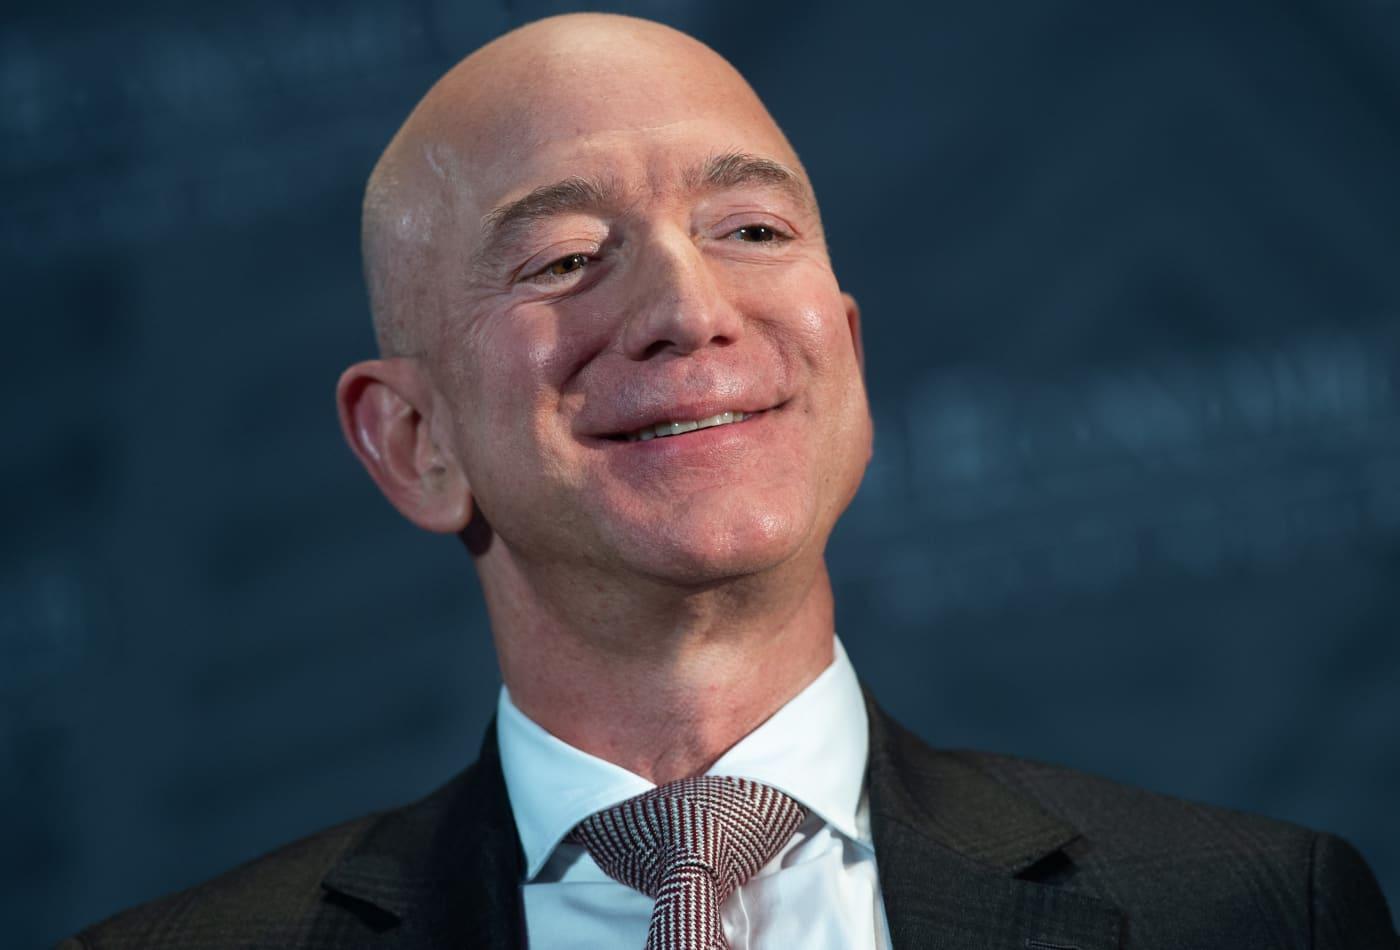 Bezos sells nearly $2 billion worth of Amazon shares